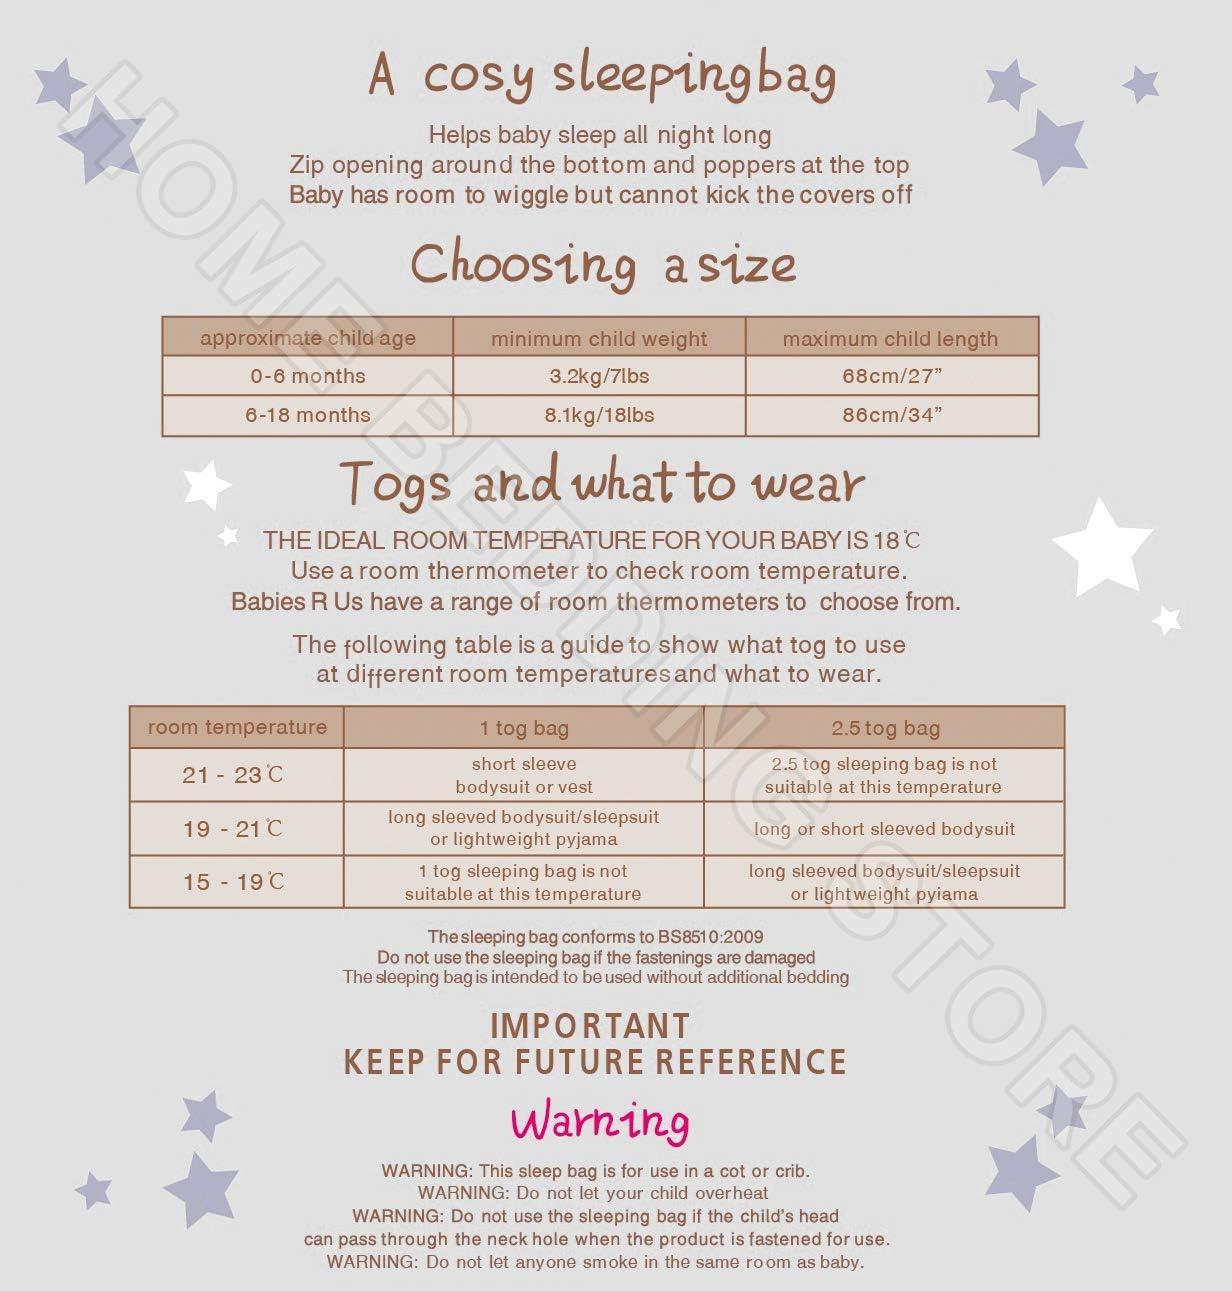 My Little World Nursery Baby Pink Blue Boys Girls Sleepbag Bird Dog 2.5 Tog Sleeping Bag 0-6mths, Blue Dog Motif